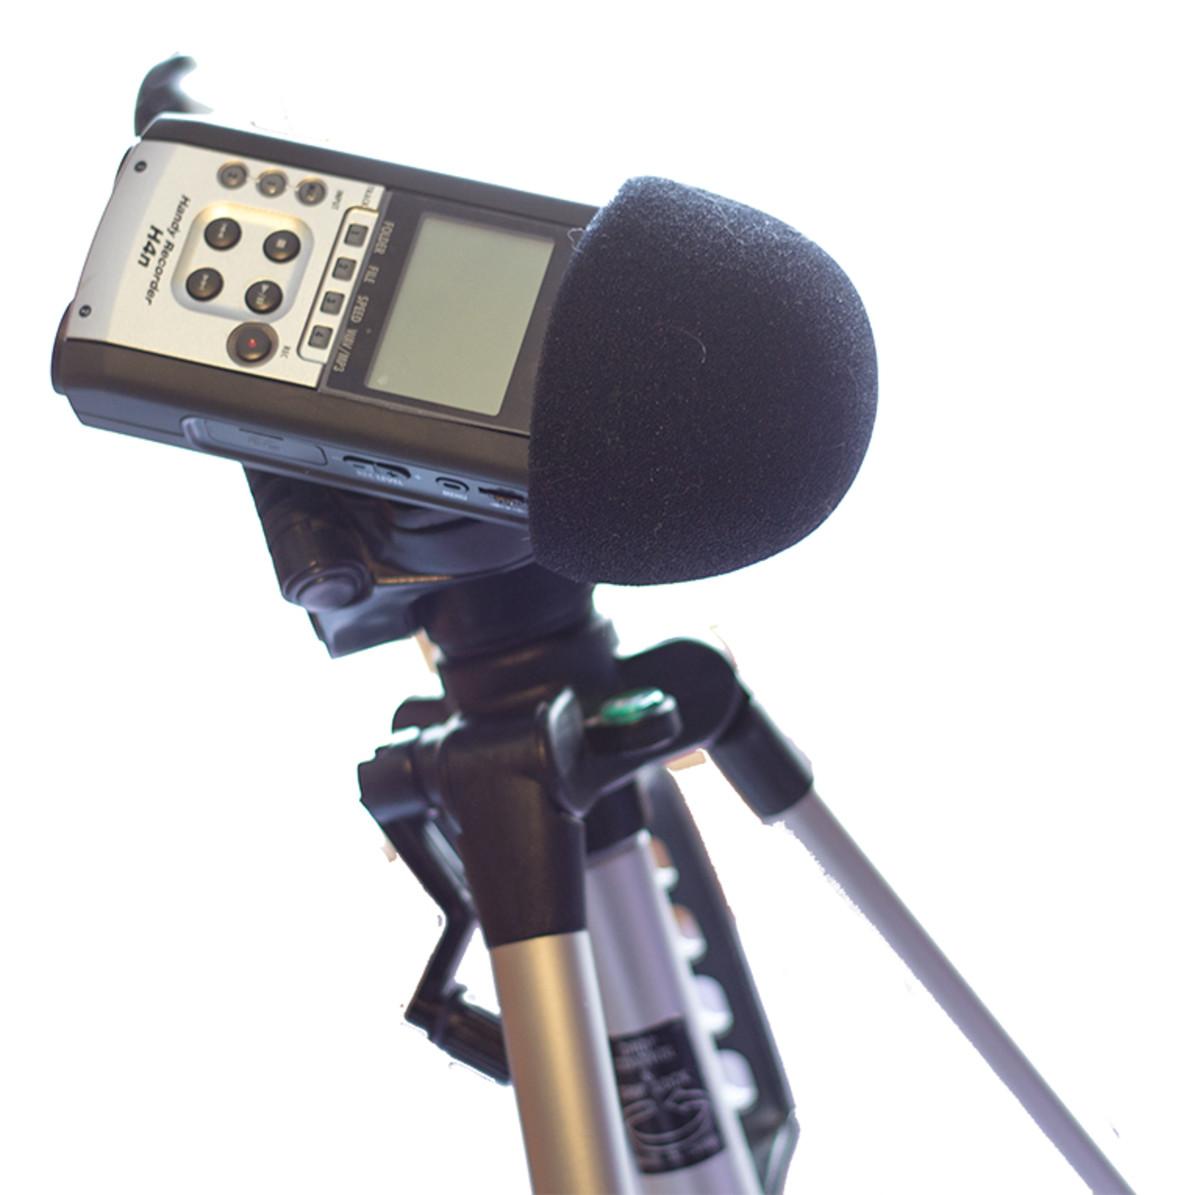 Zoom H4n with windscreen on tripod.